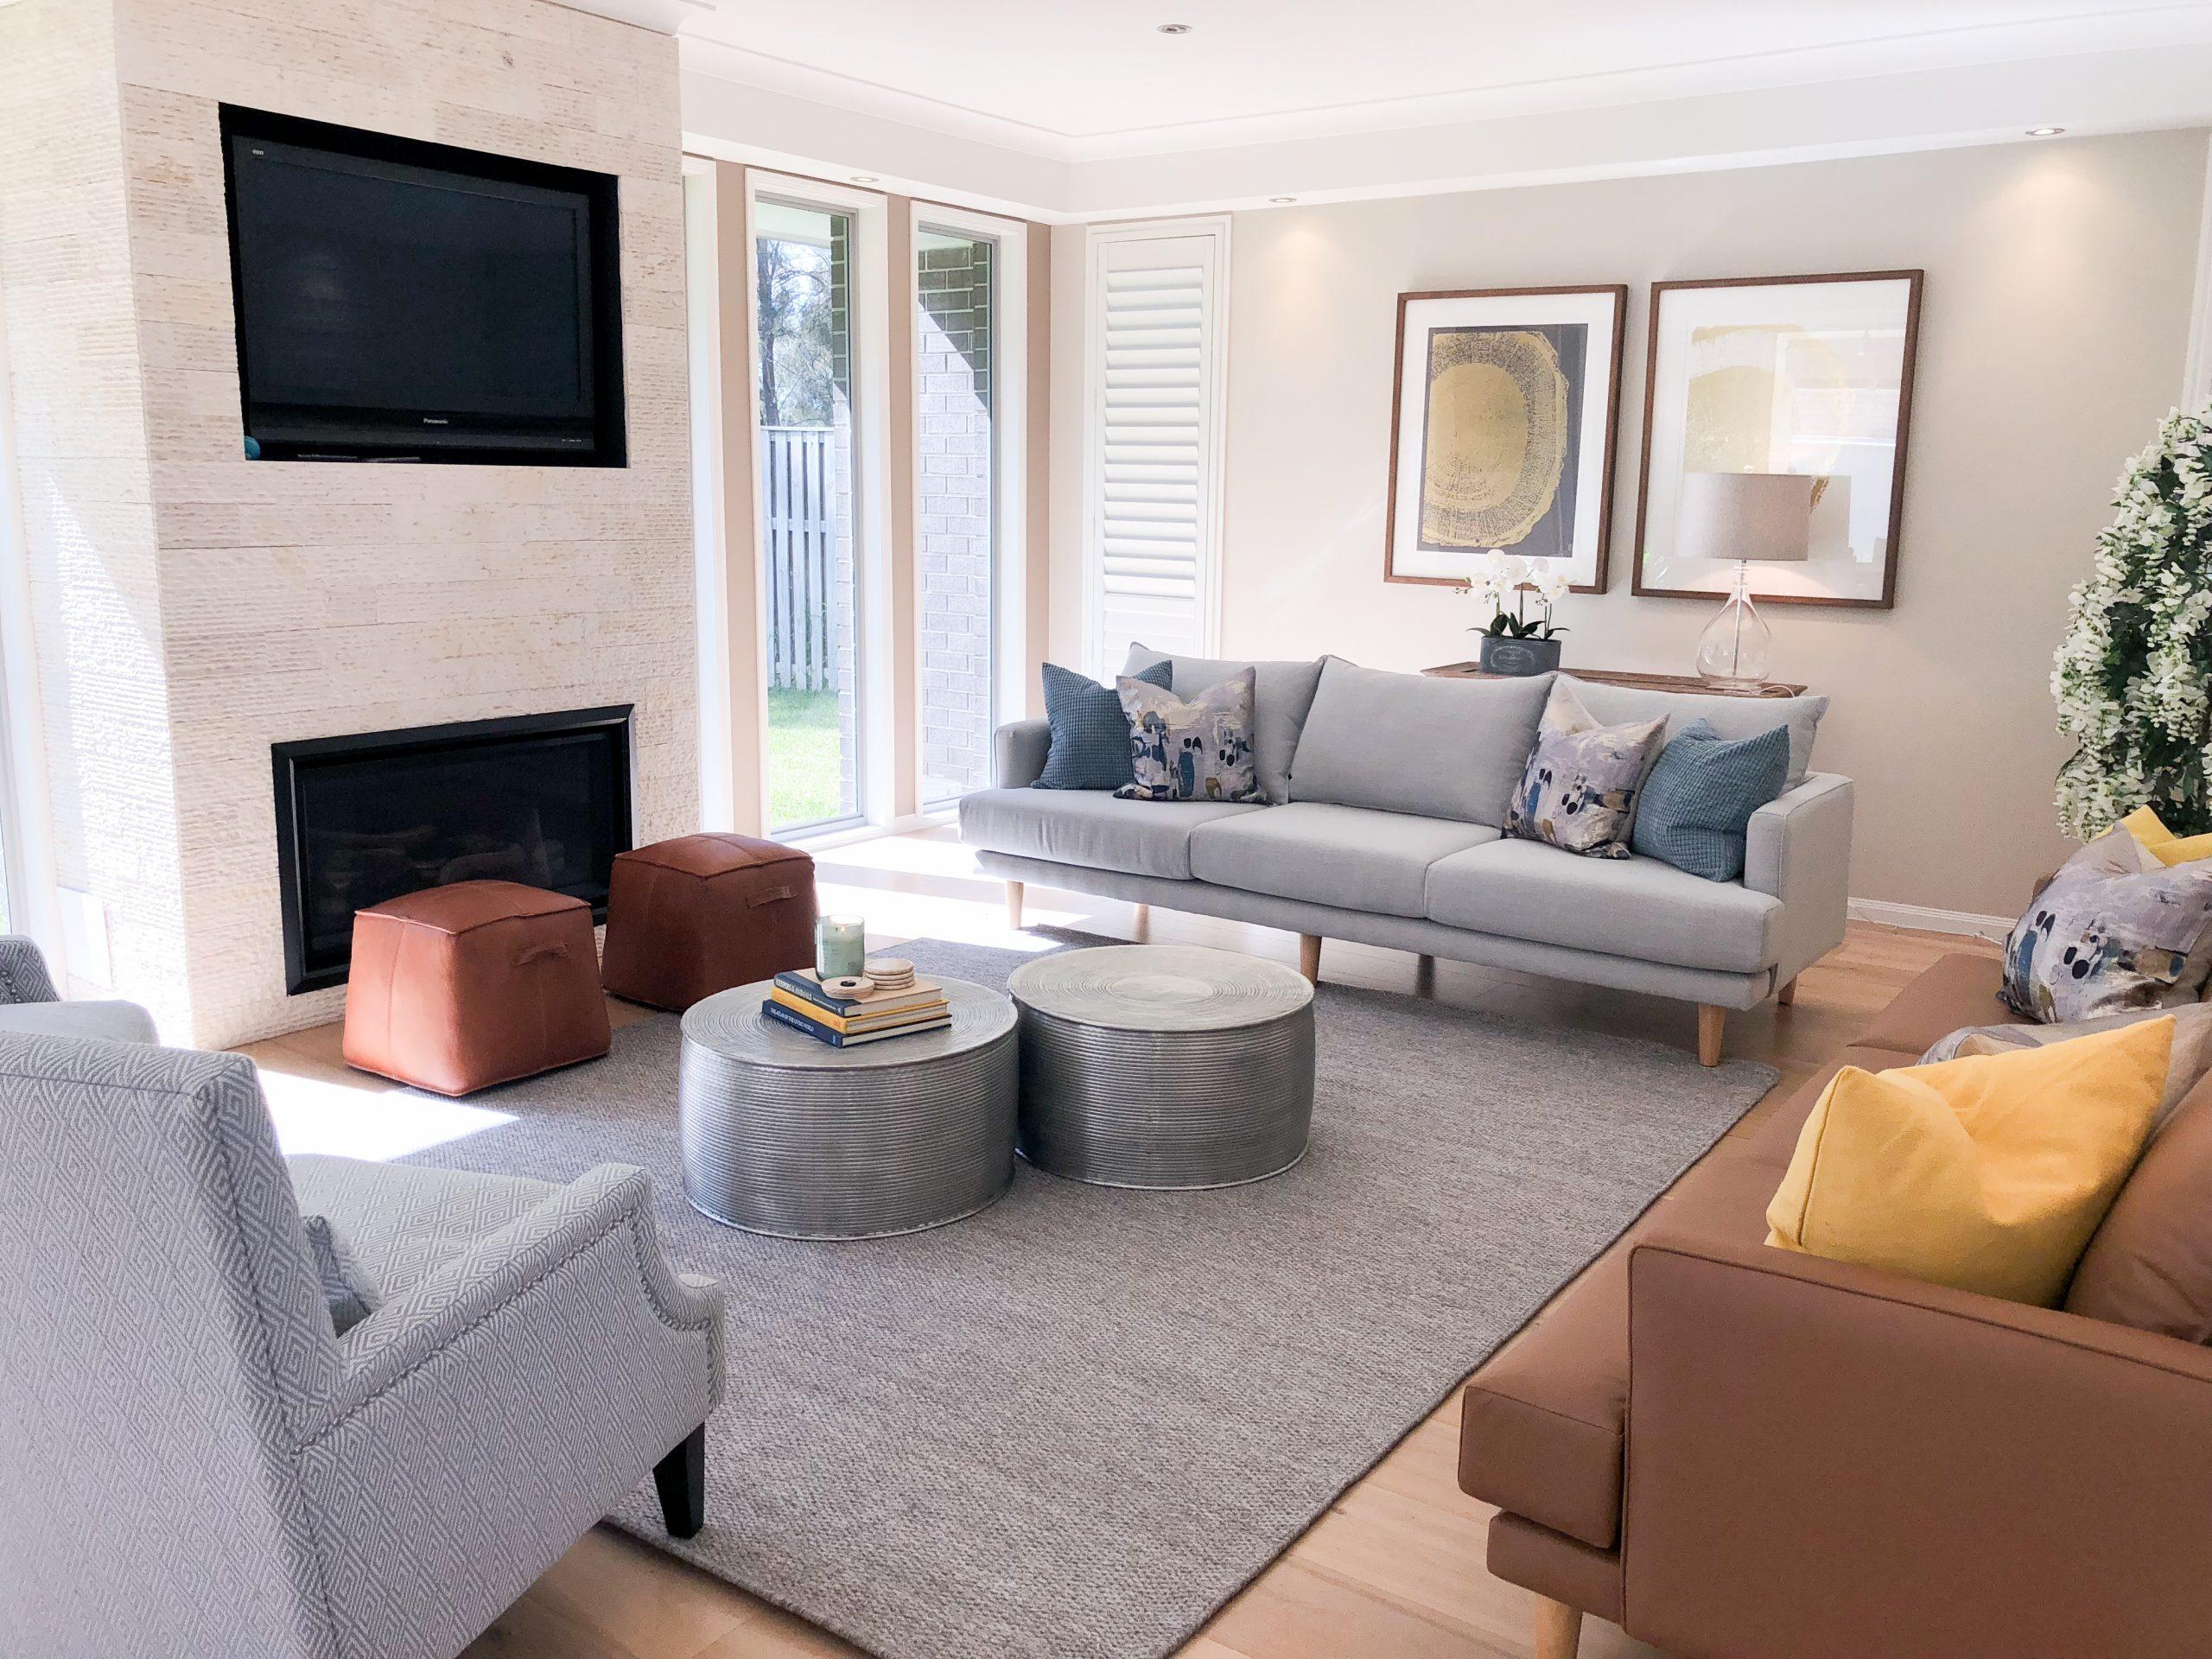 https://www.ivyandfinch.com.au/wp-content/uploads/2021/02/Interior-Design-Hope-Island-Lounge-Room-scaled.jpg